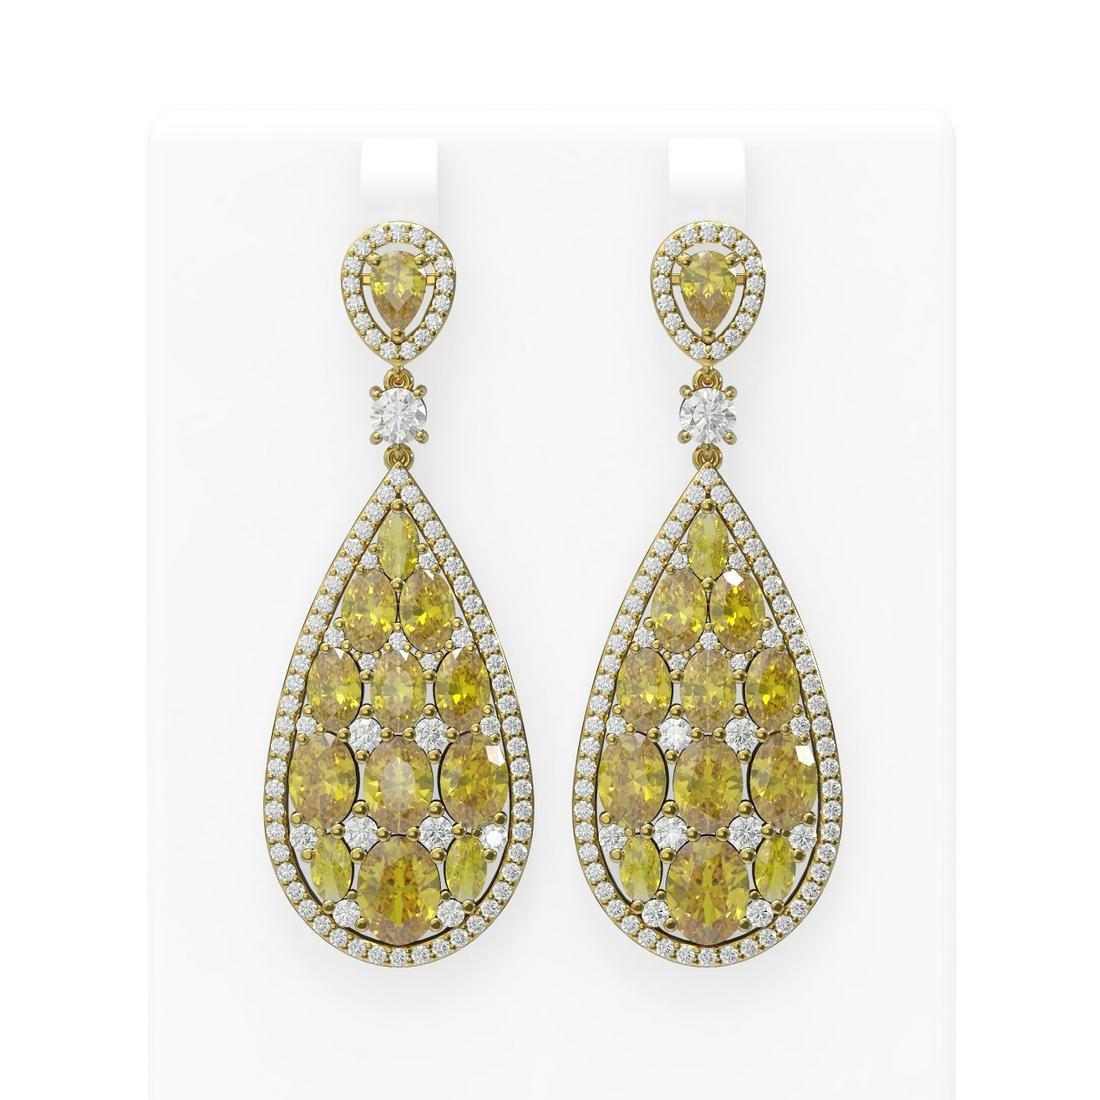 24.01 ctw Canary Citrine & Diamond Earrings 18K Yellow